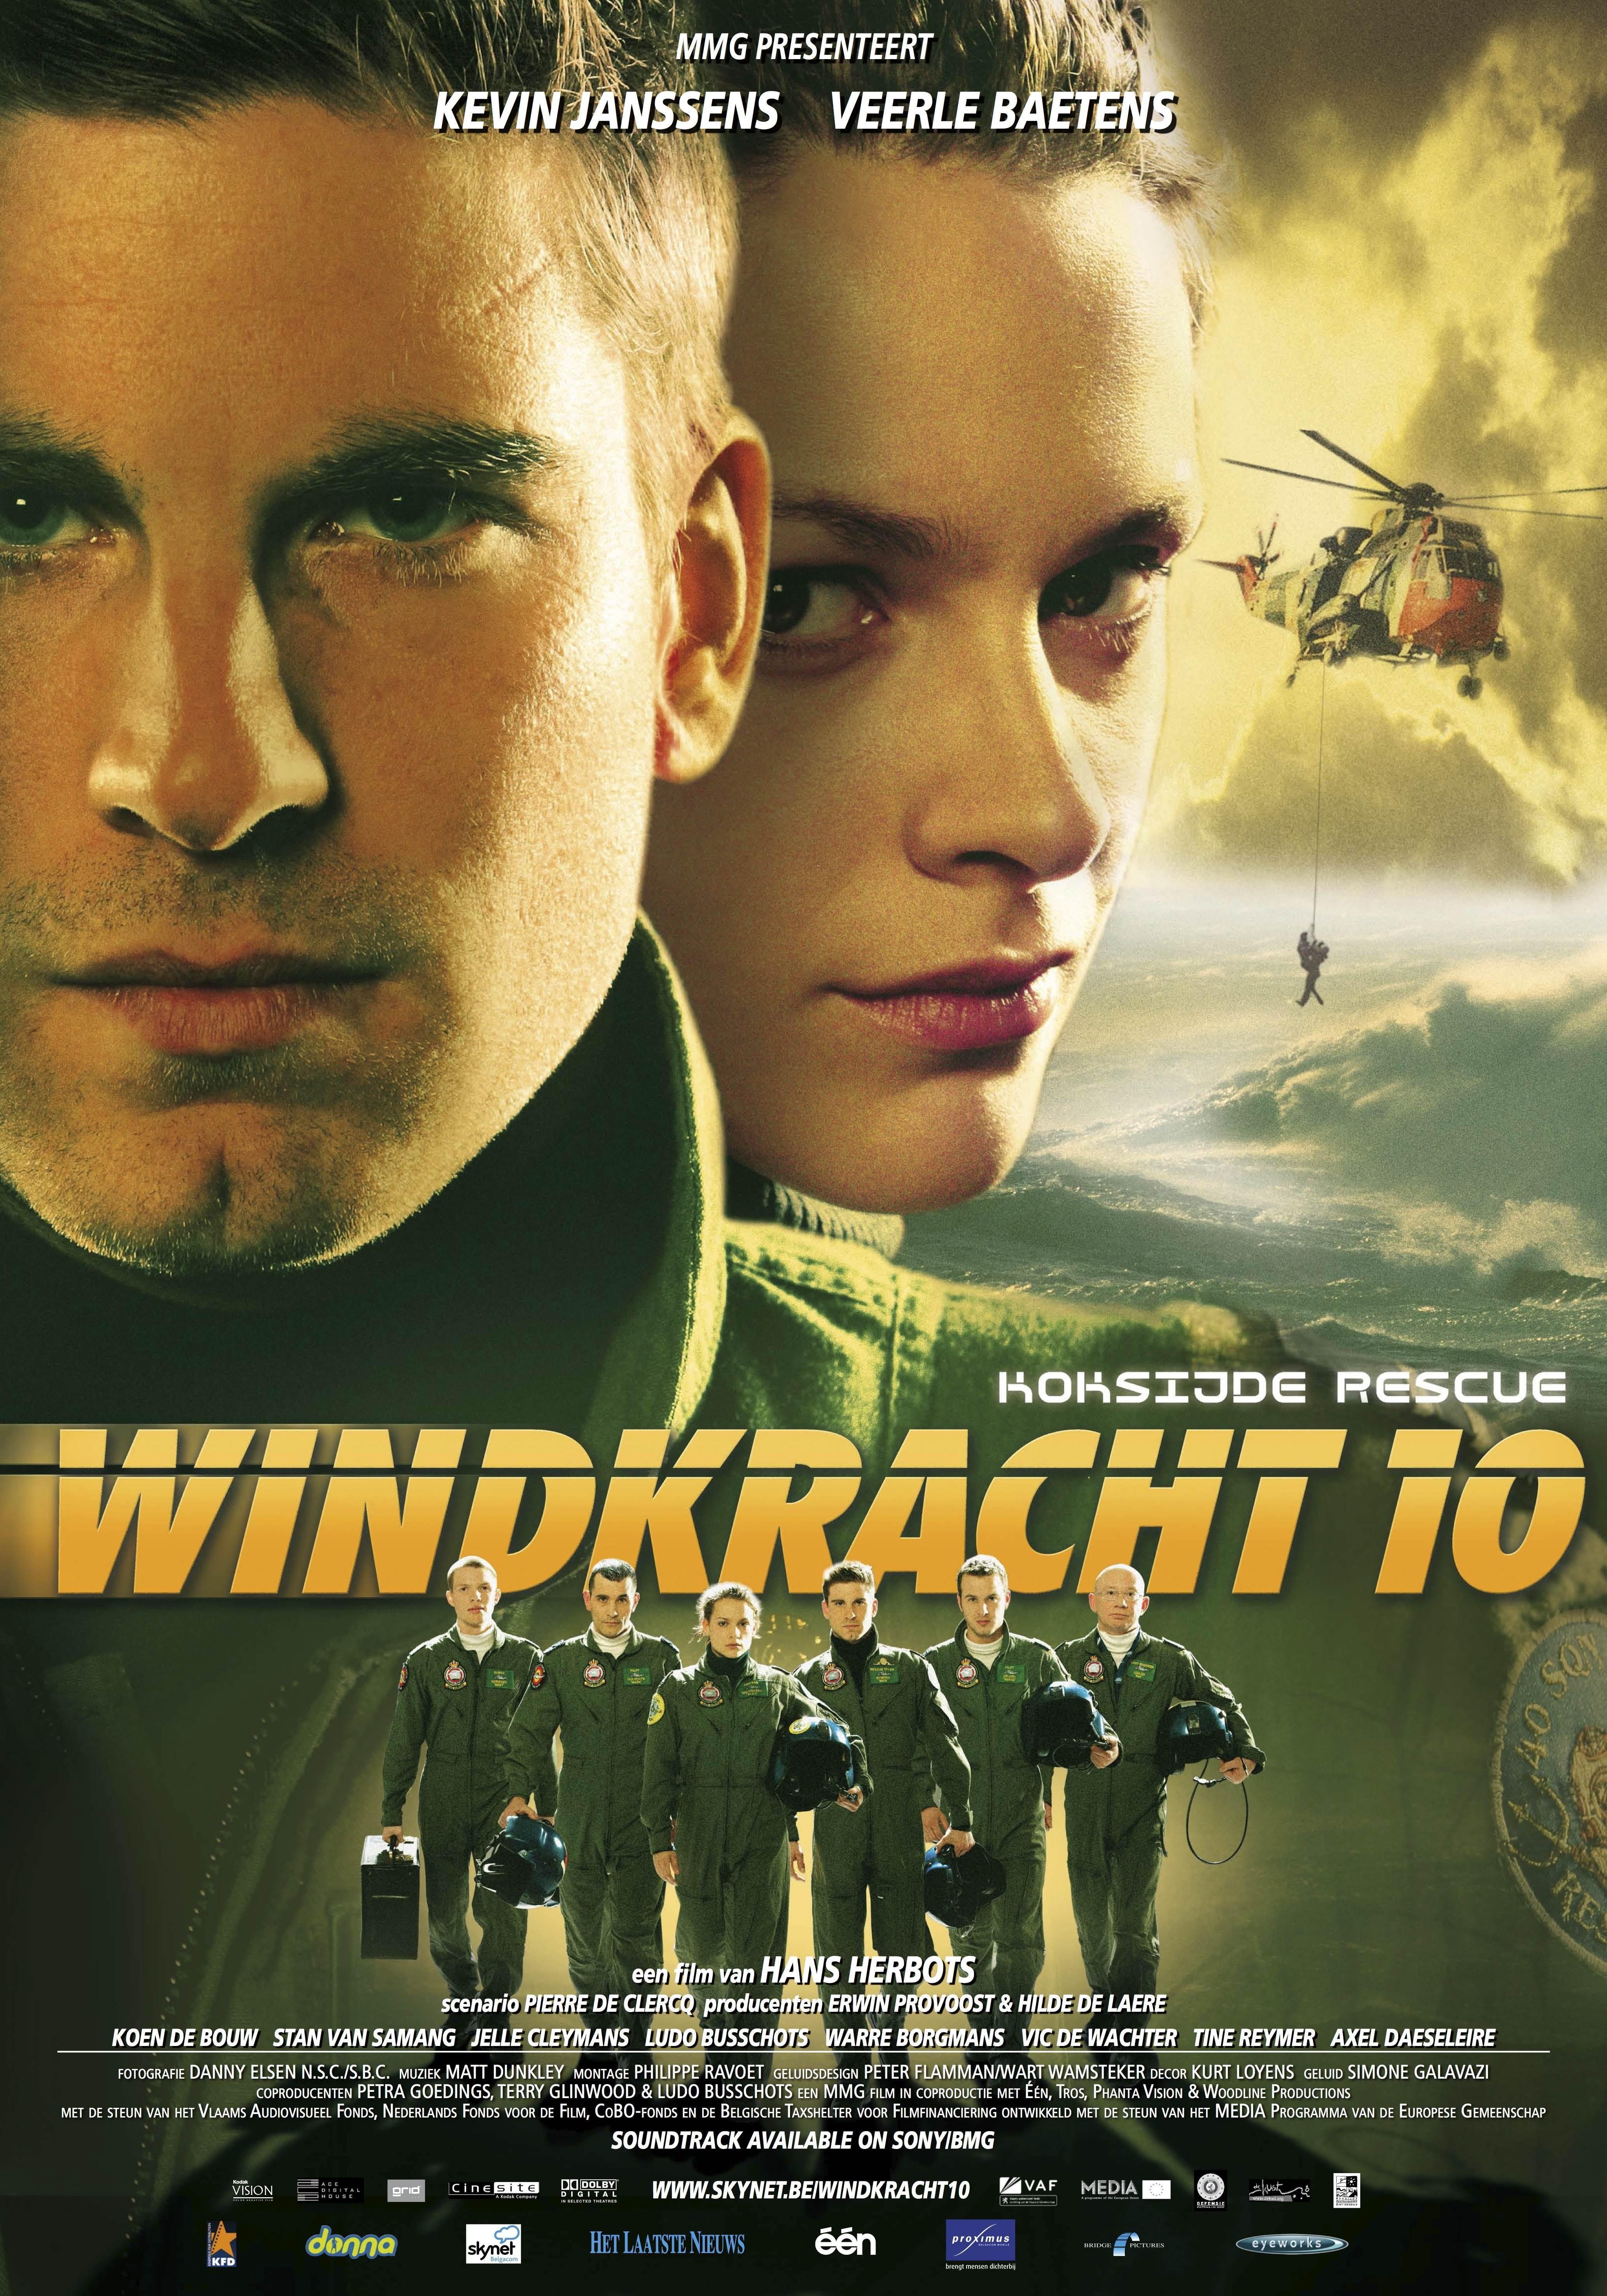 Veerle Baetens and Kevin Janssens in Windkracht 10: Koksijde Rescue (2006)